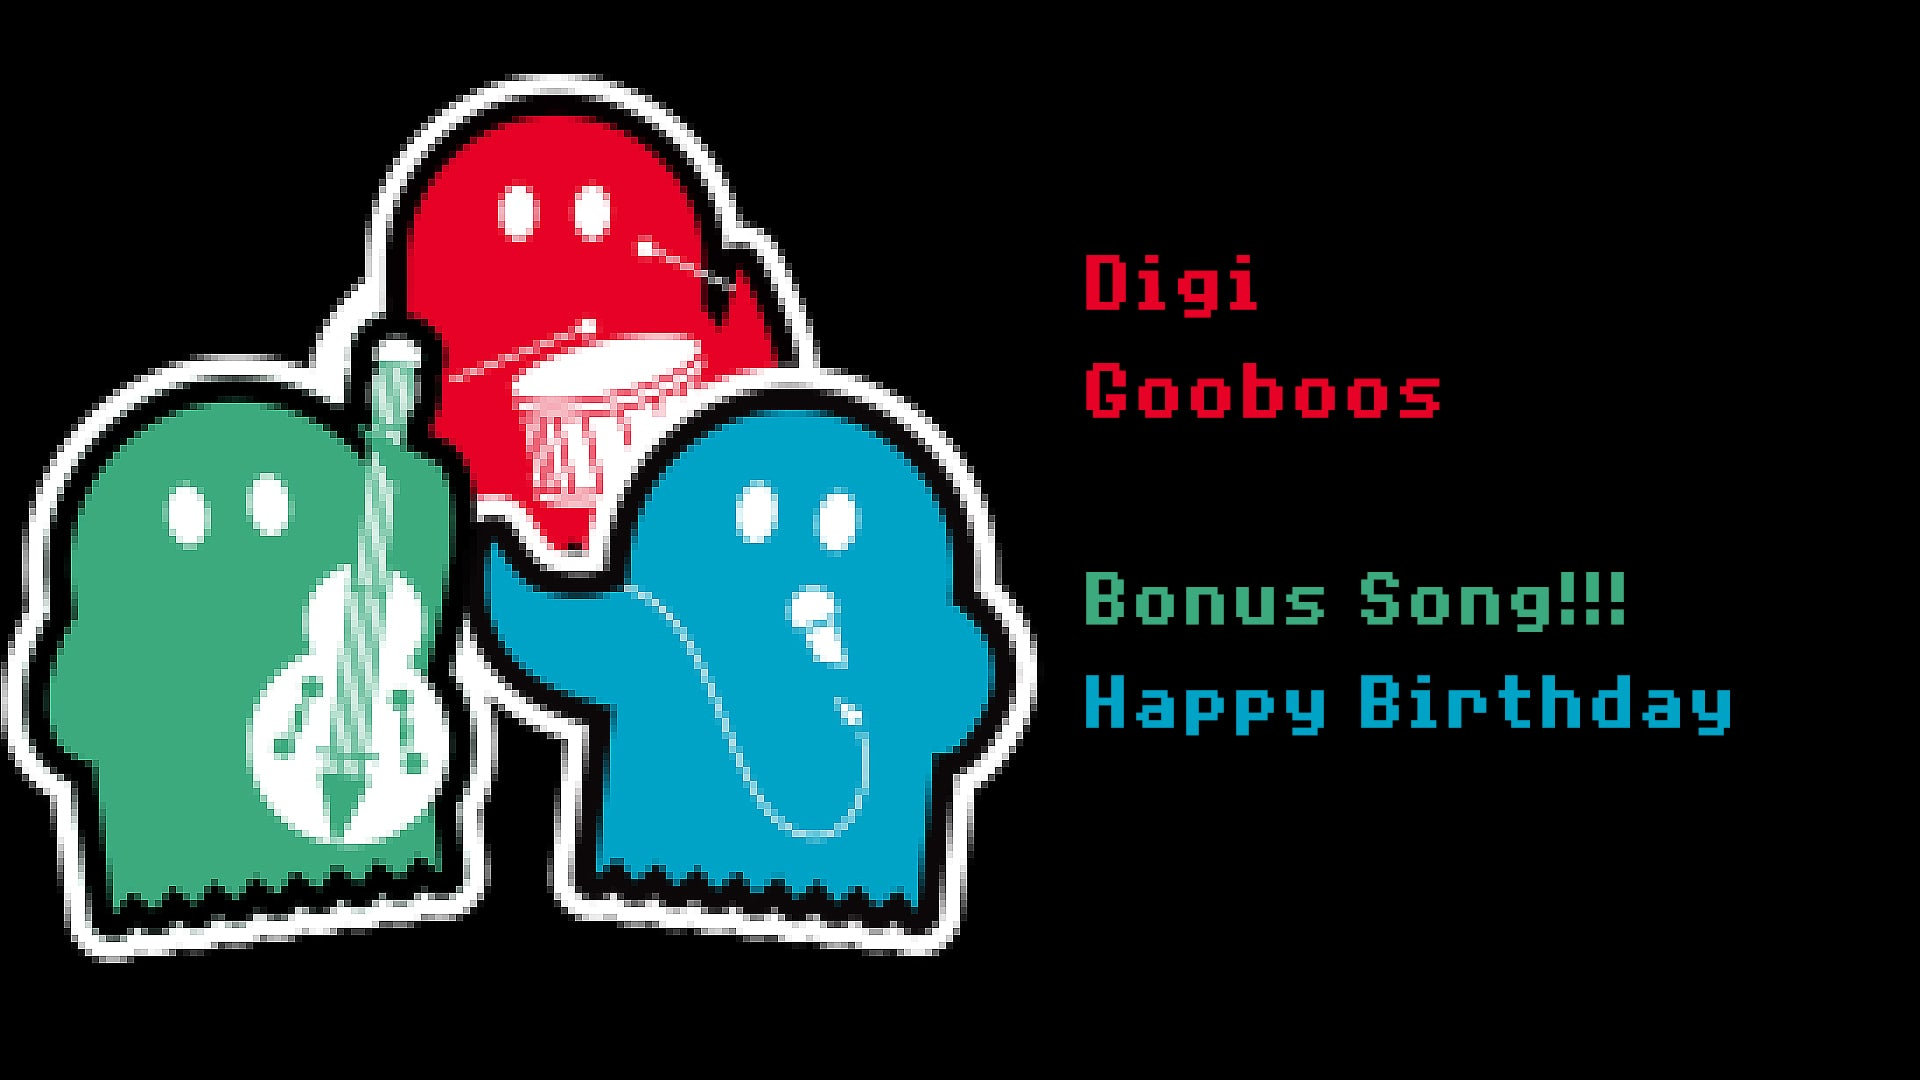 Digi GooBoos Bonus - Happy Birthday